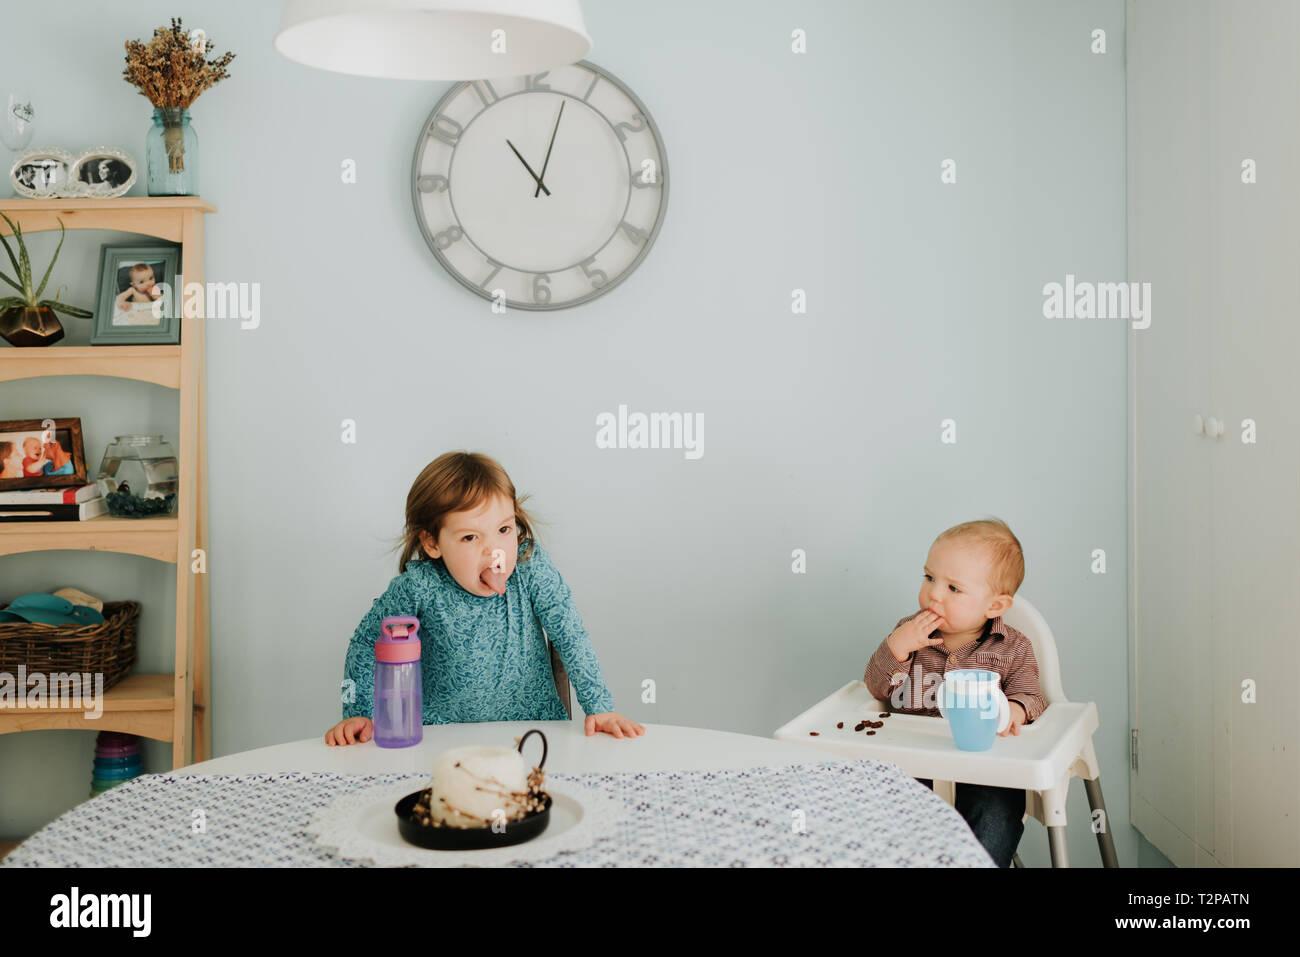 Toddler femmina a tavola e baby fratello in sedia alta Foto Stock